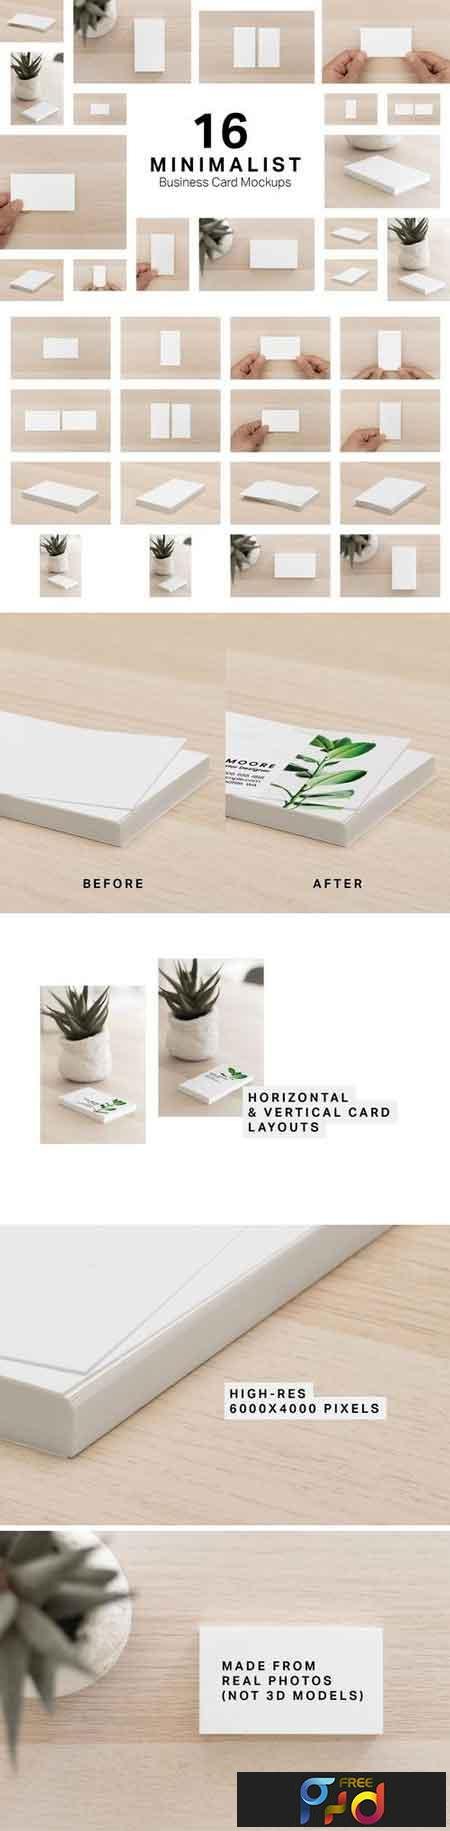 16 Minimalist Business Card Mockups 3251258 1